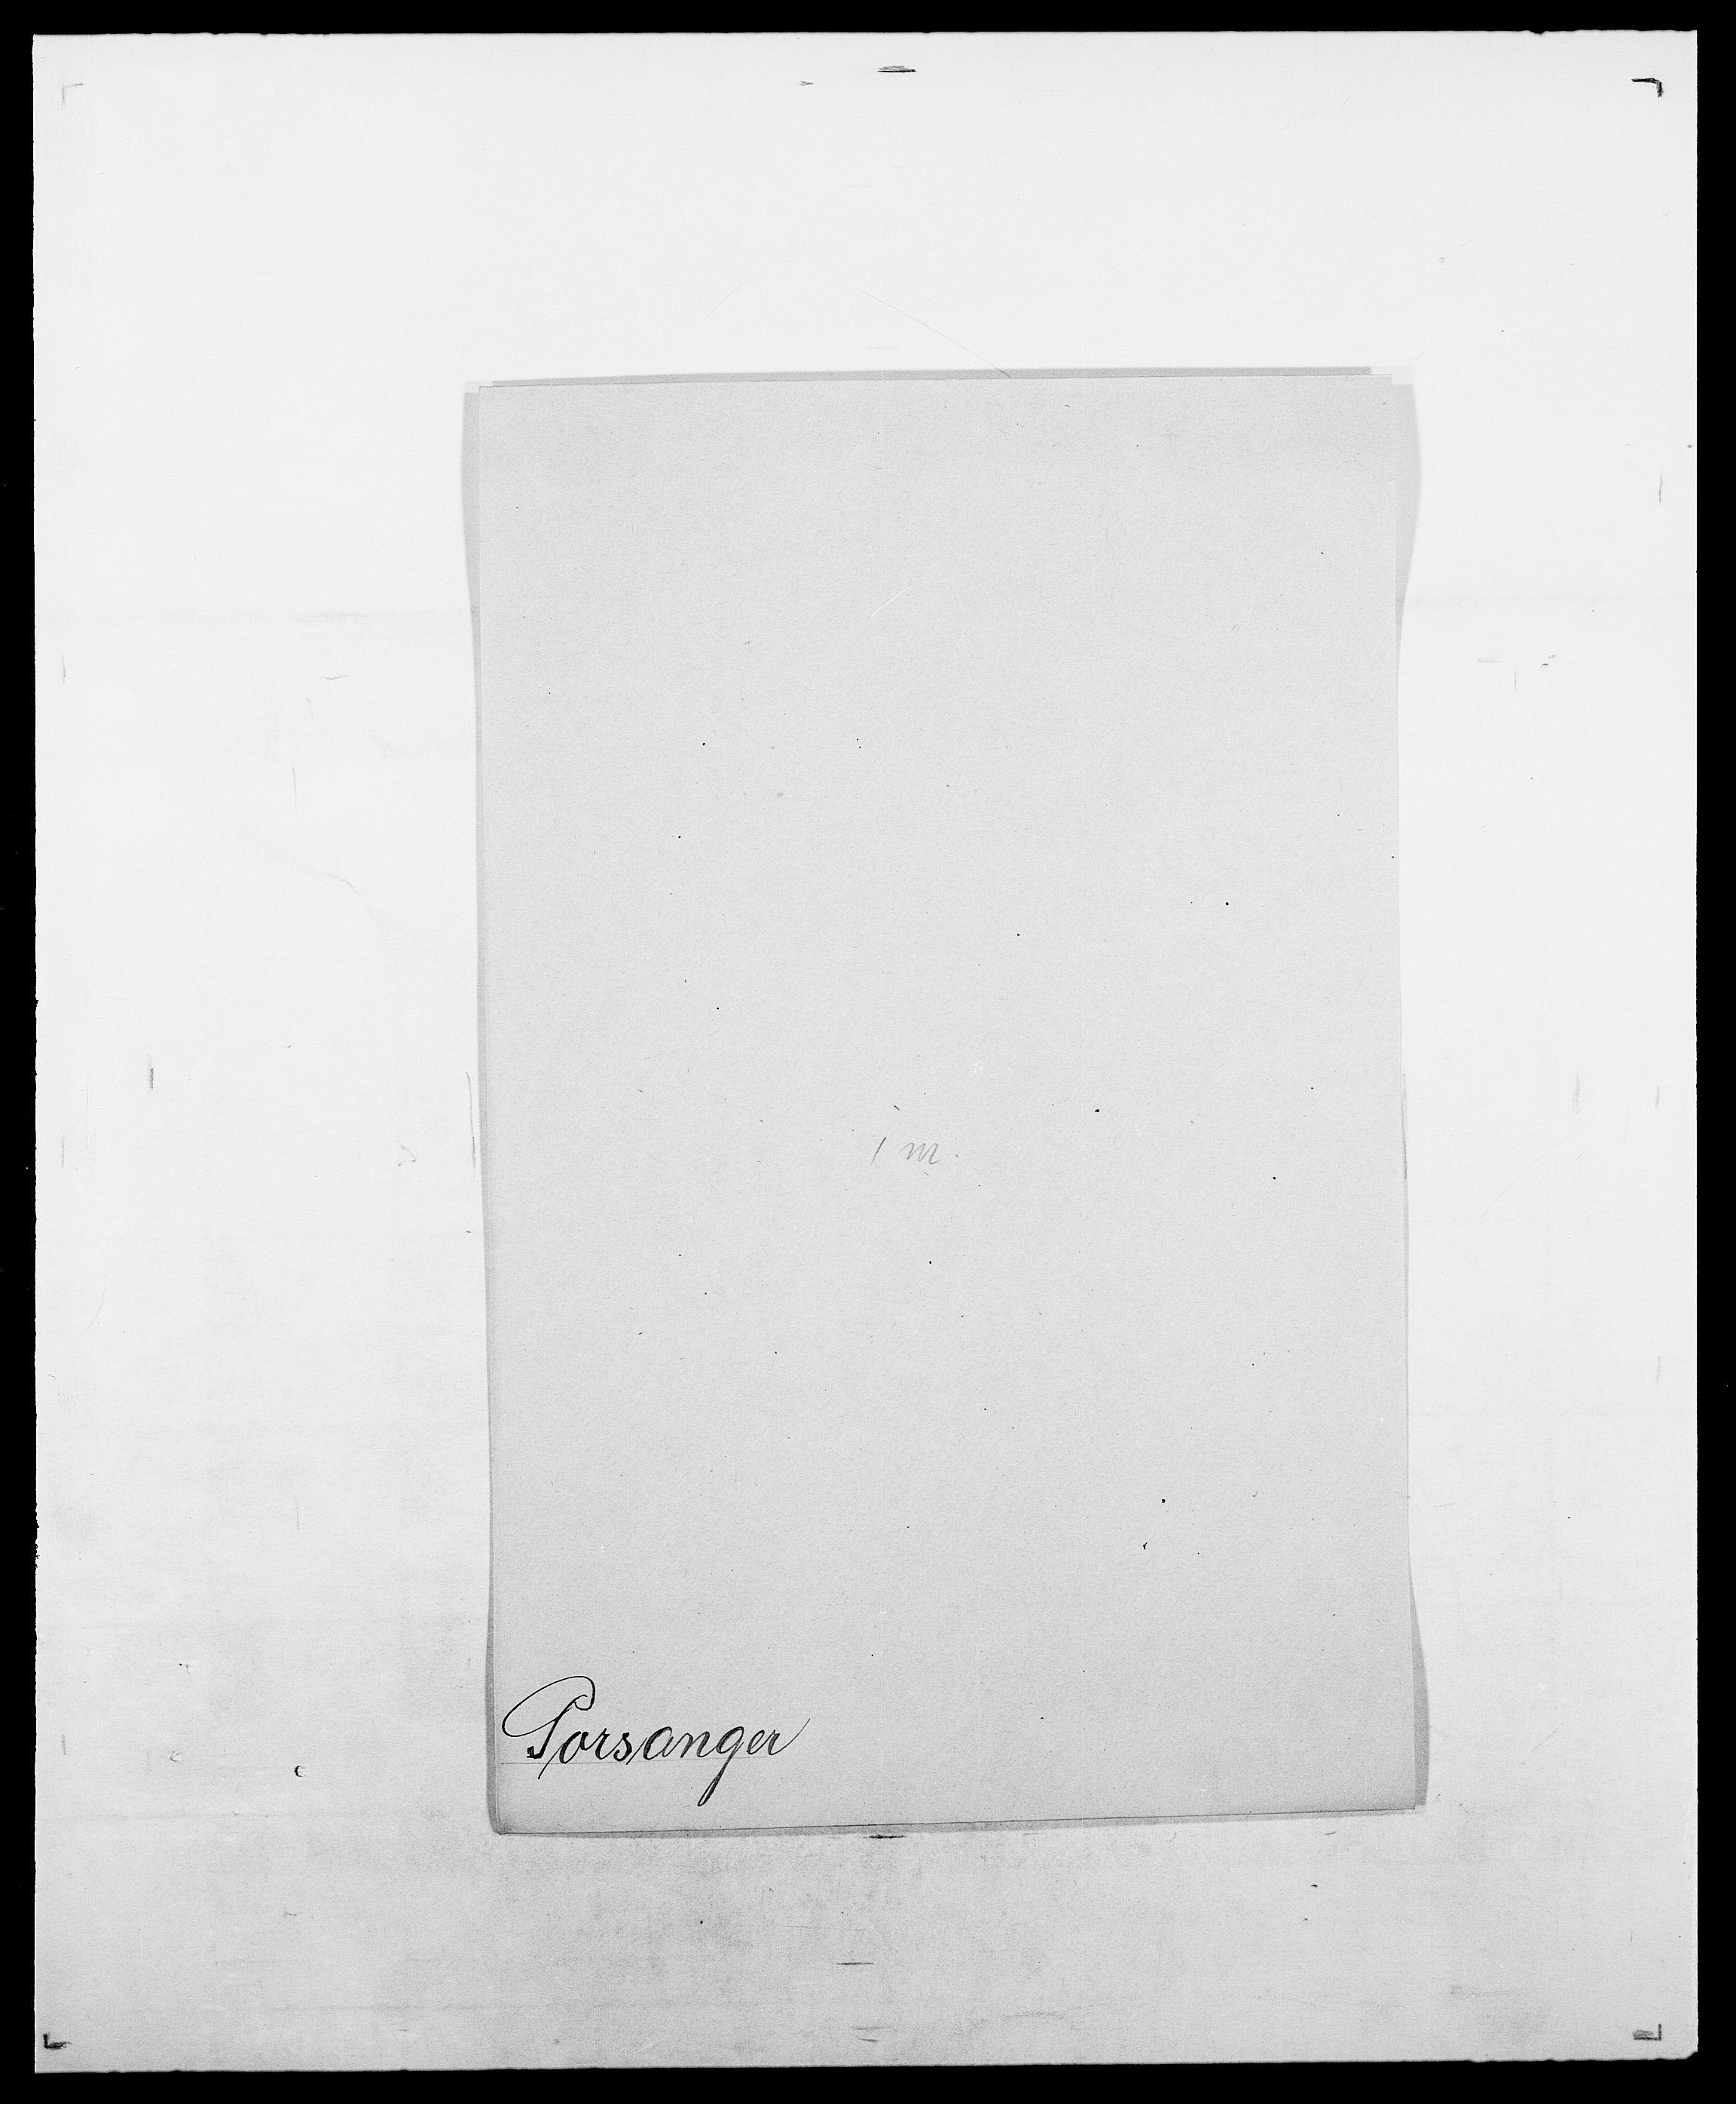 SAO, Delgobe, Charles Antoine - samling, D/Da/L0031: de Place - Raaum, s. 238